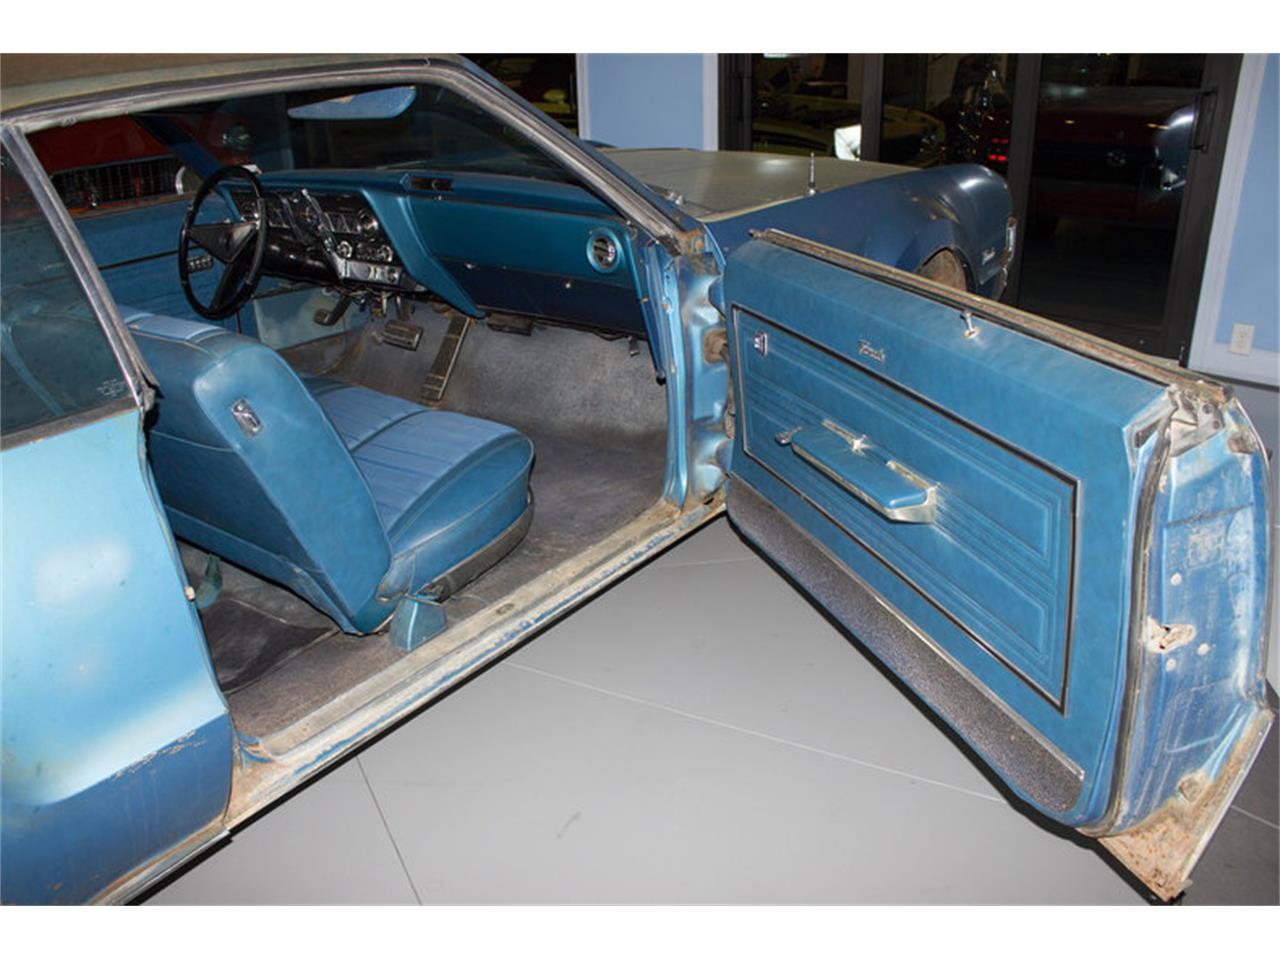 Large Picture of '67 Oldsmobile Toronado located in Florida - $6,997.00 - MZFB